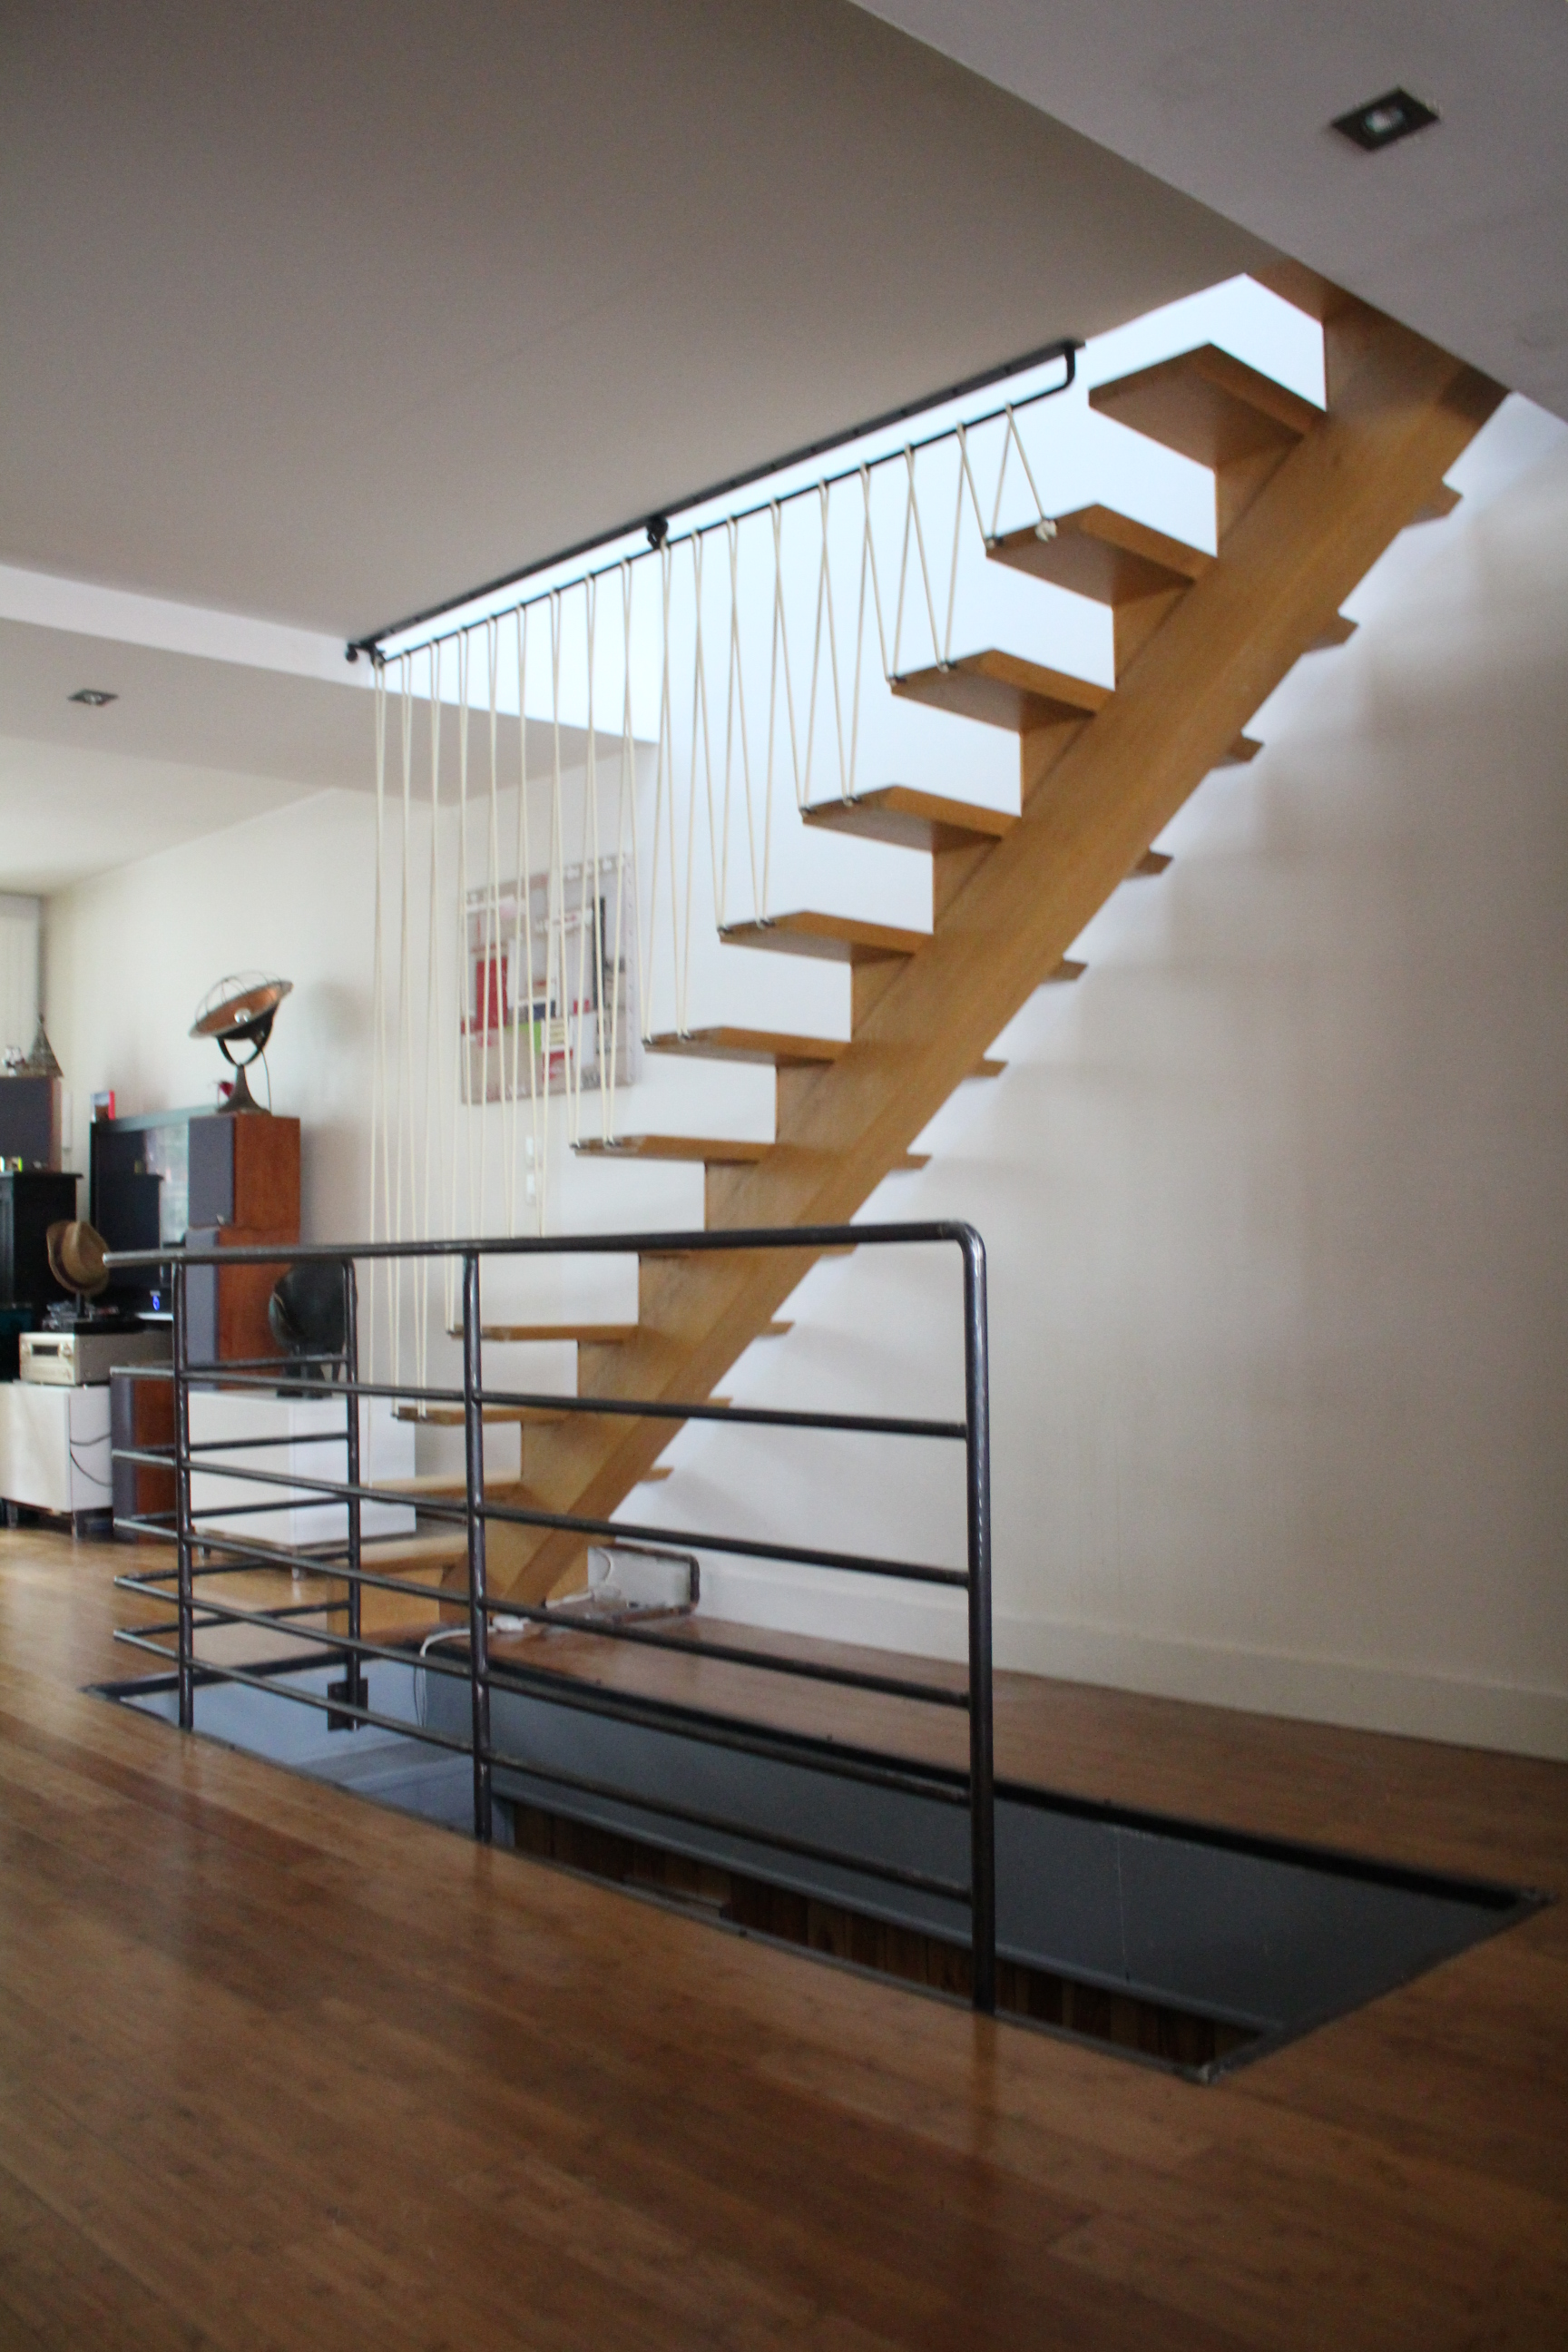 Idee Rampe Escalier #14: ... Lu0027image En Grand ... | Owhfg.com